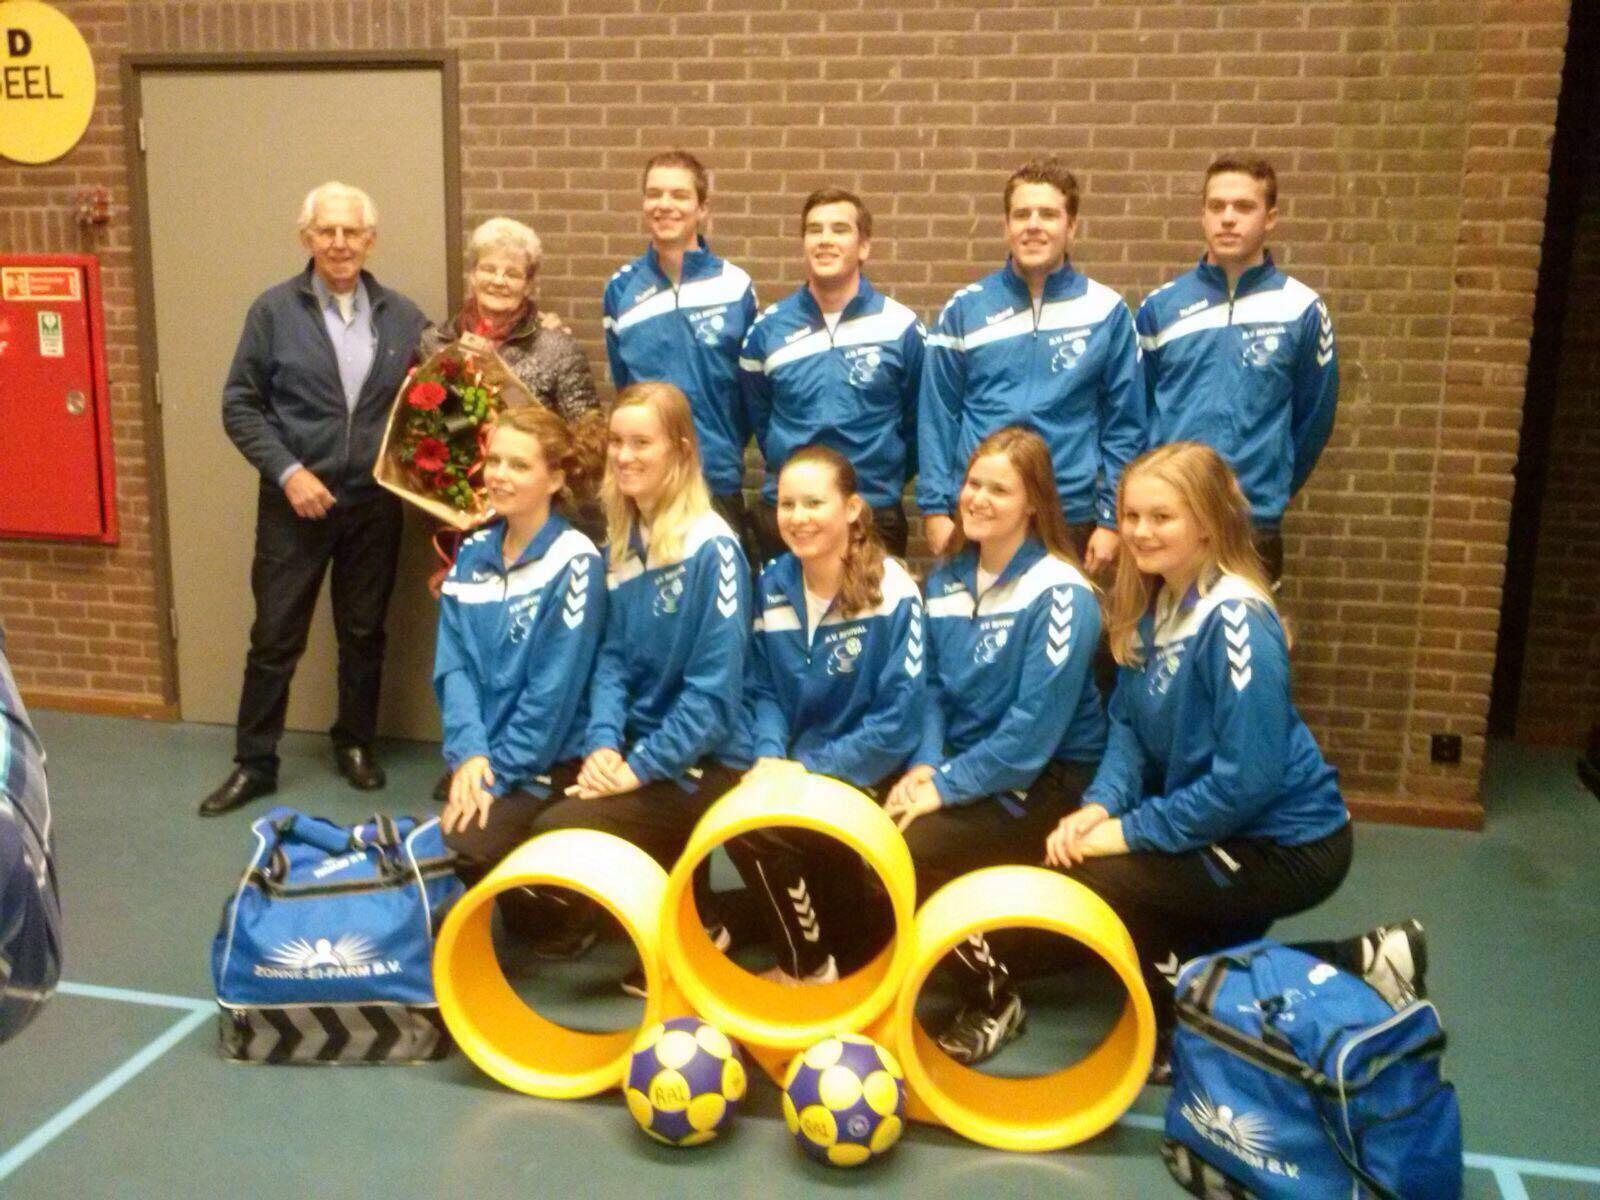 A1 ontvangt trainingspakken, shirts en tassen van sponsor Zonne Ei Farm